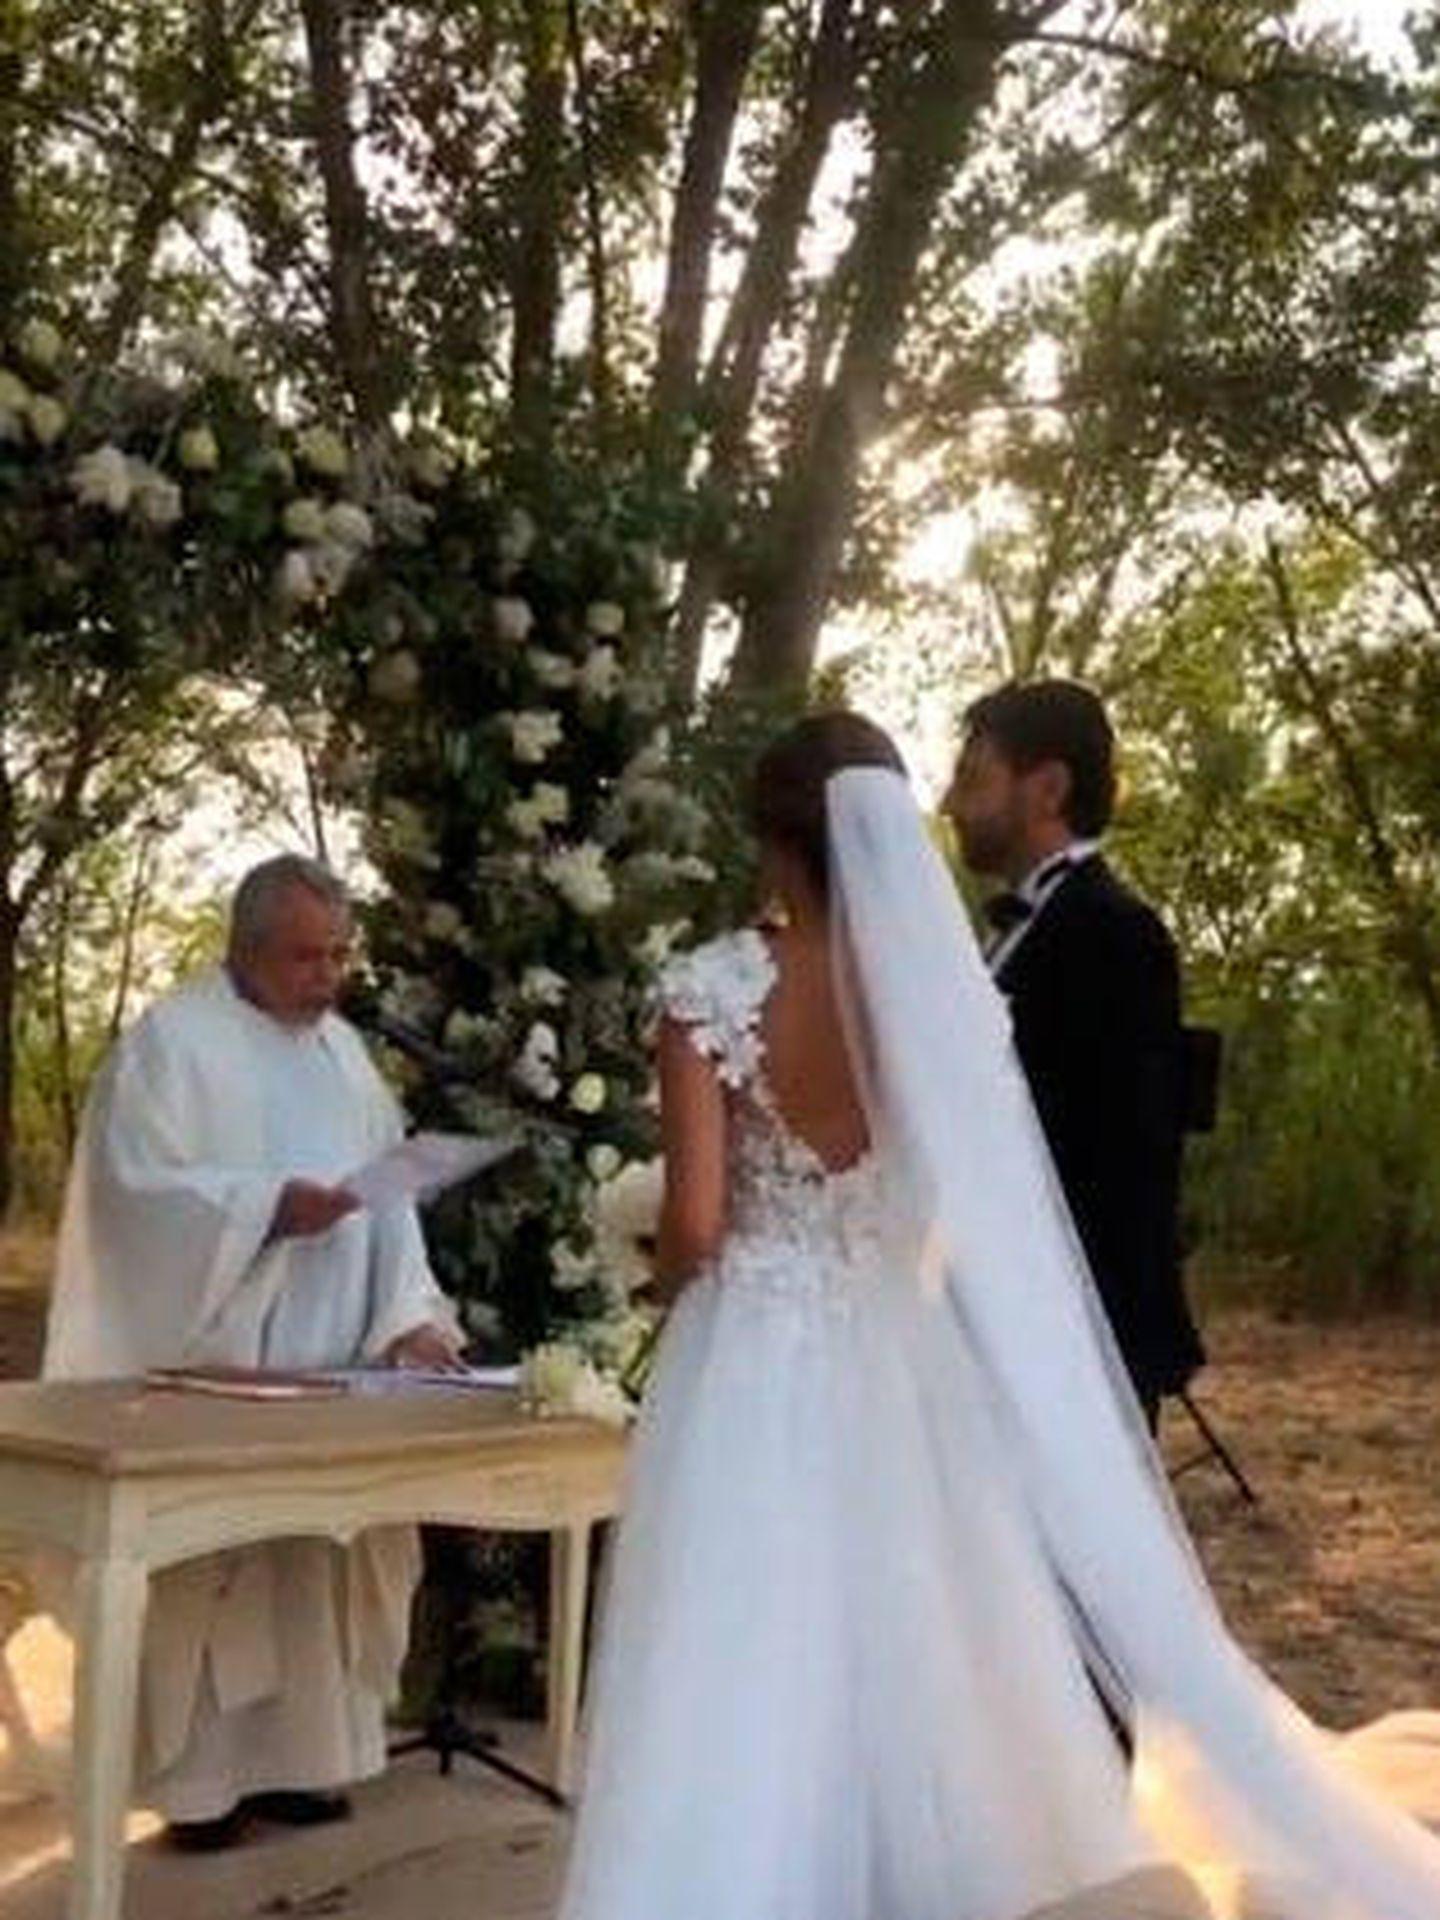 Alexandra Pereira y Gahssan Fallaha en su boda. (IG)